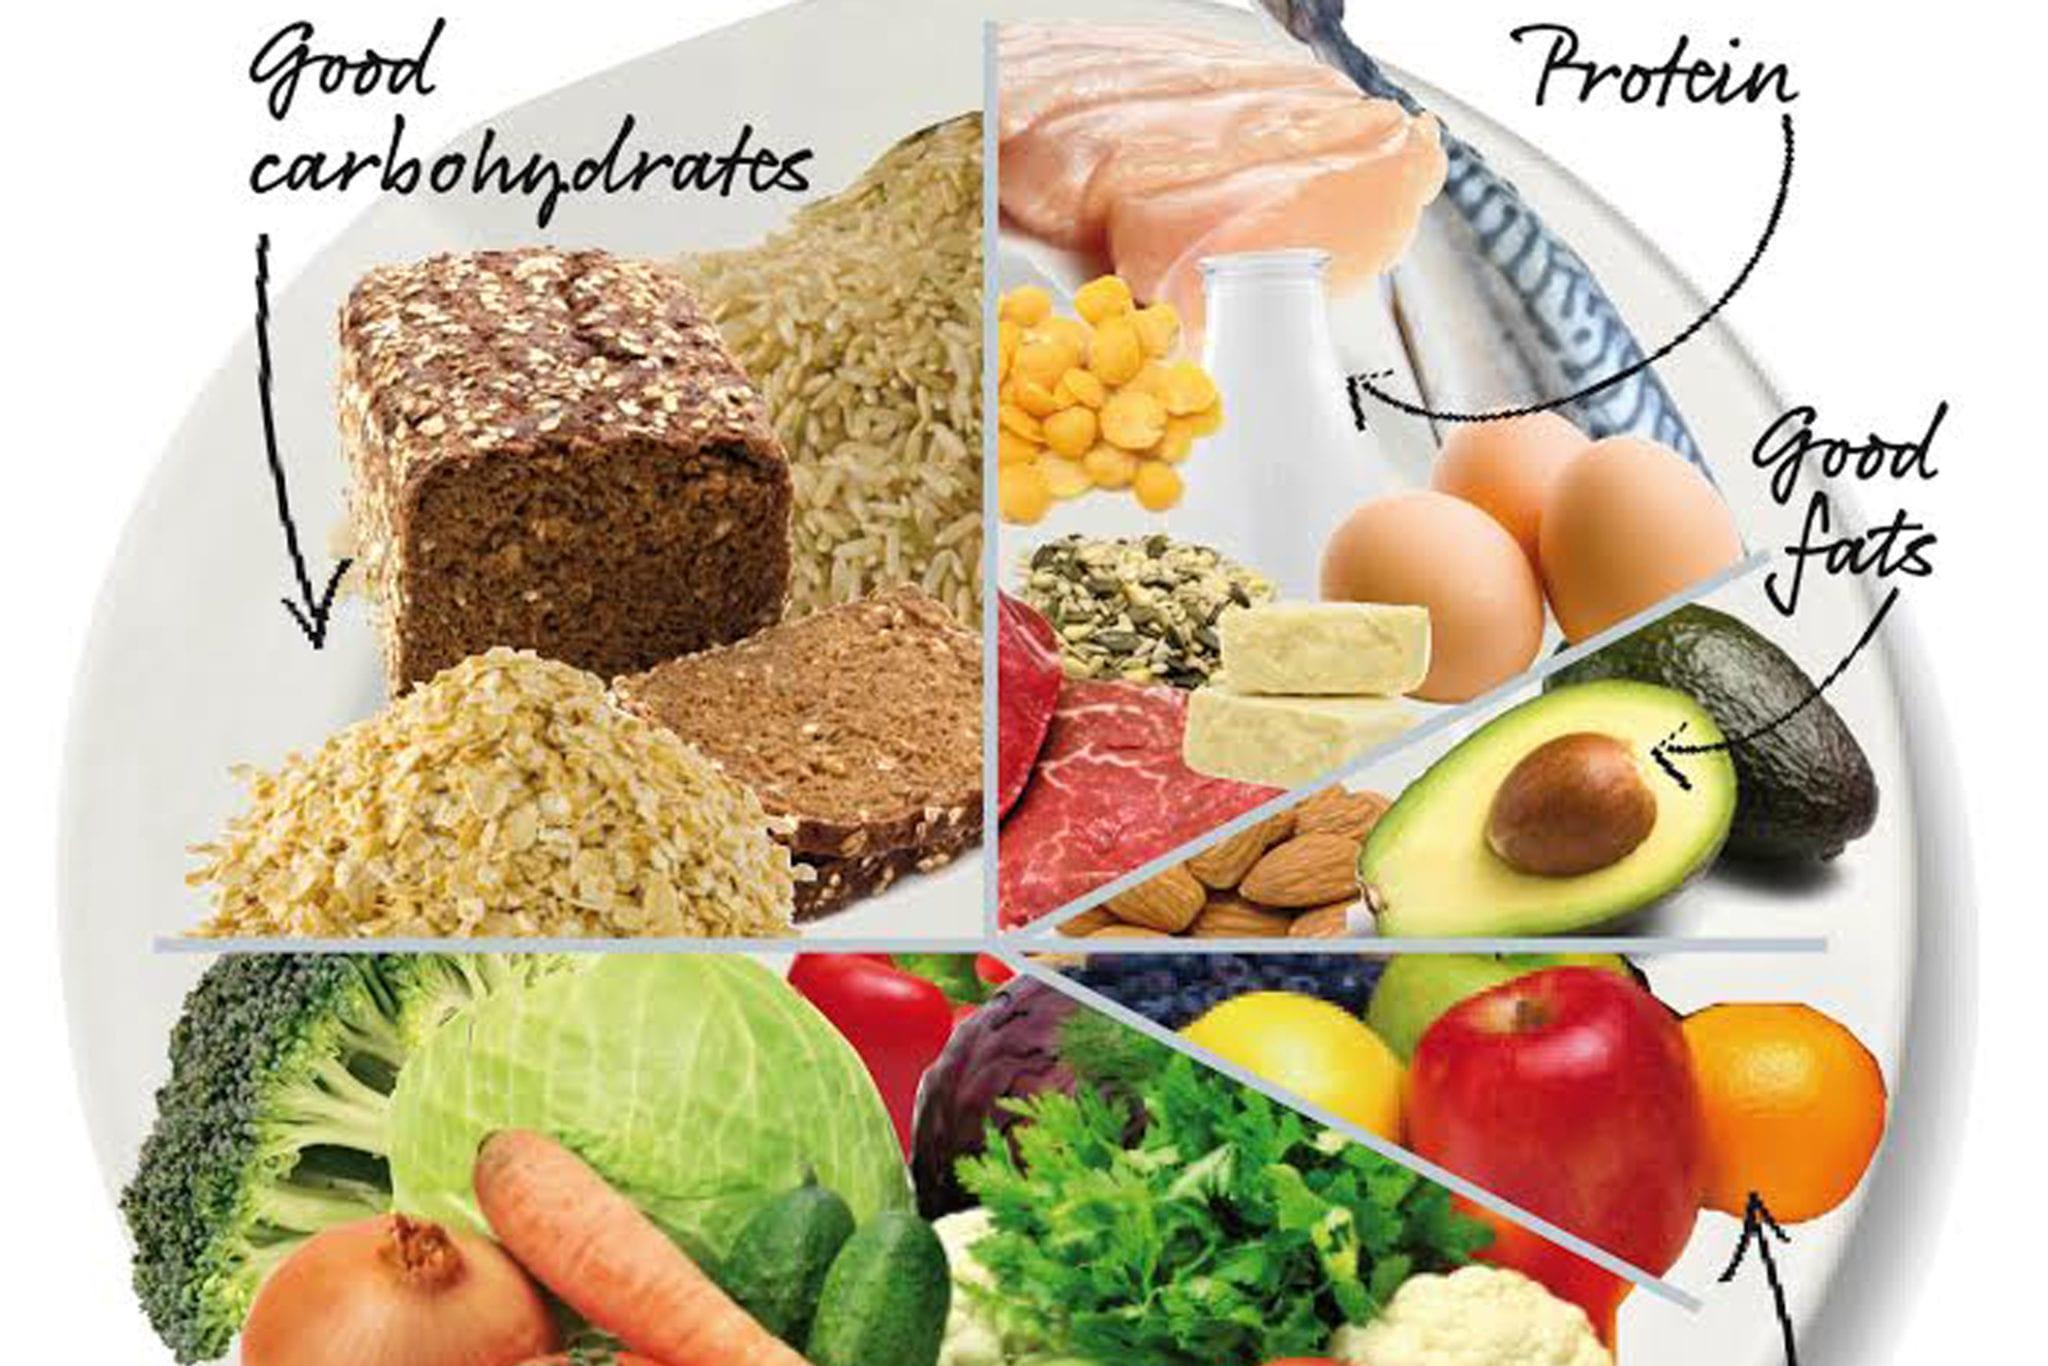 Heart Healthy Food Magazine